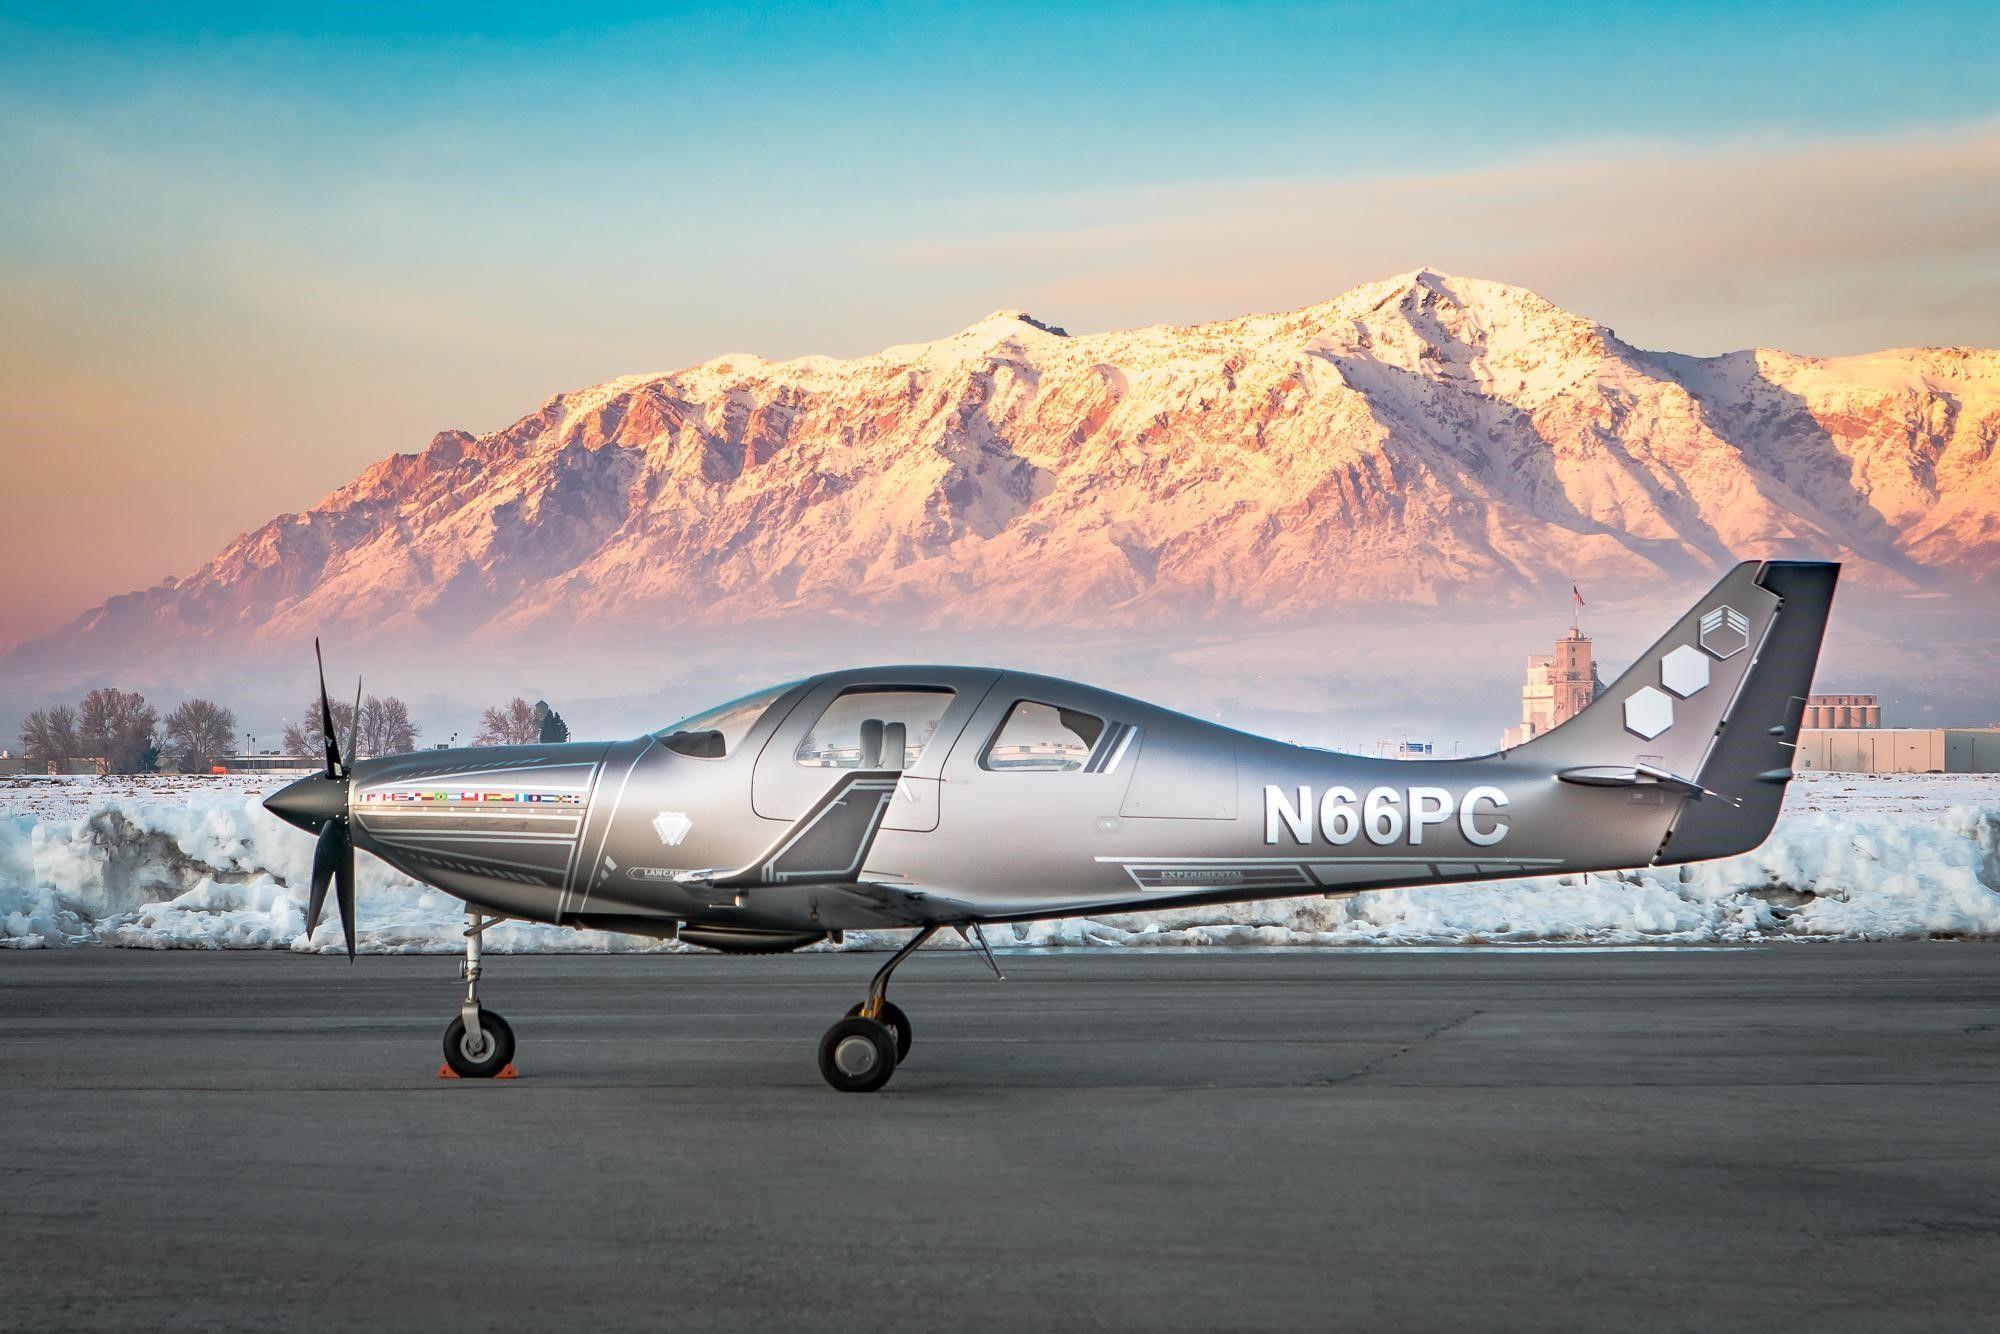 Lancair IVP (2001) (325,000) Private jet plane